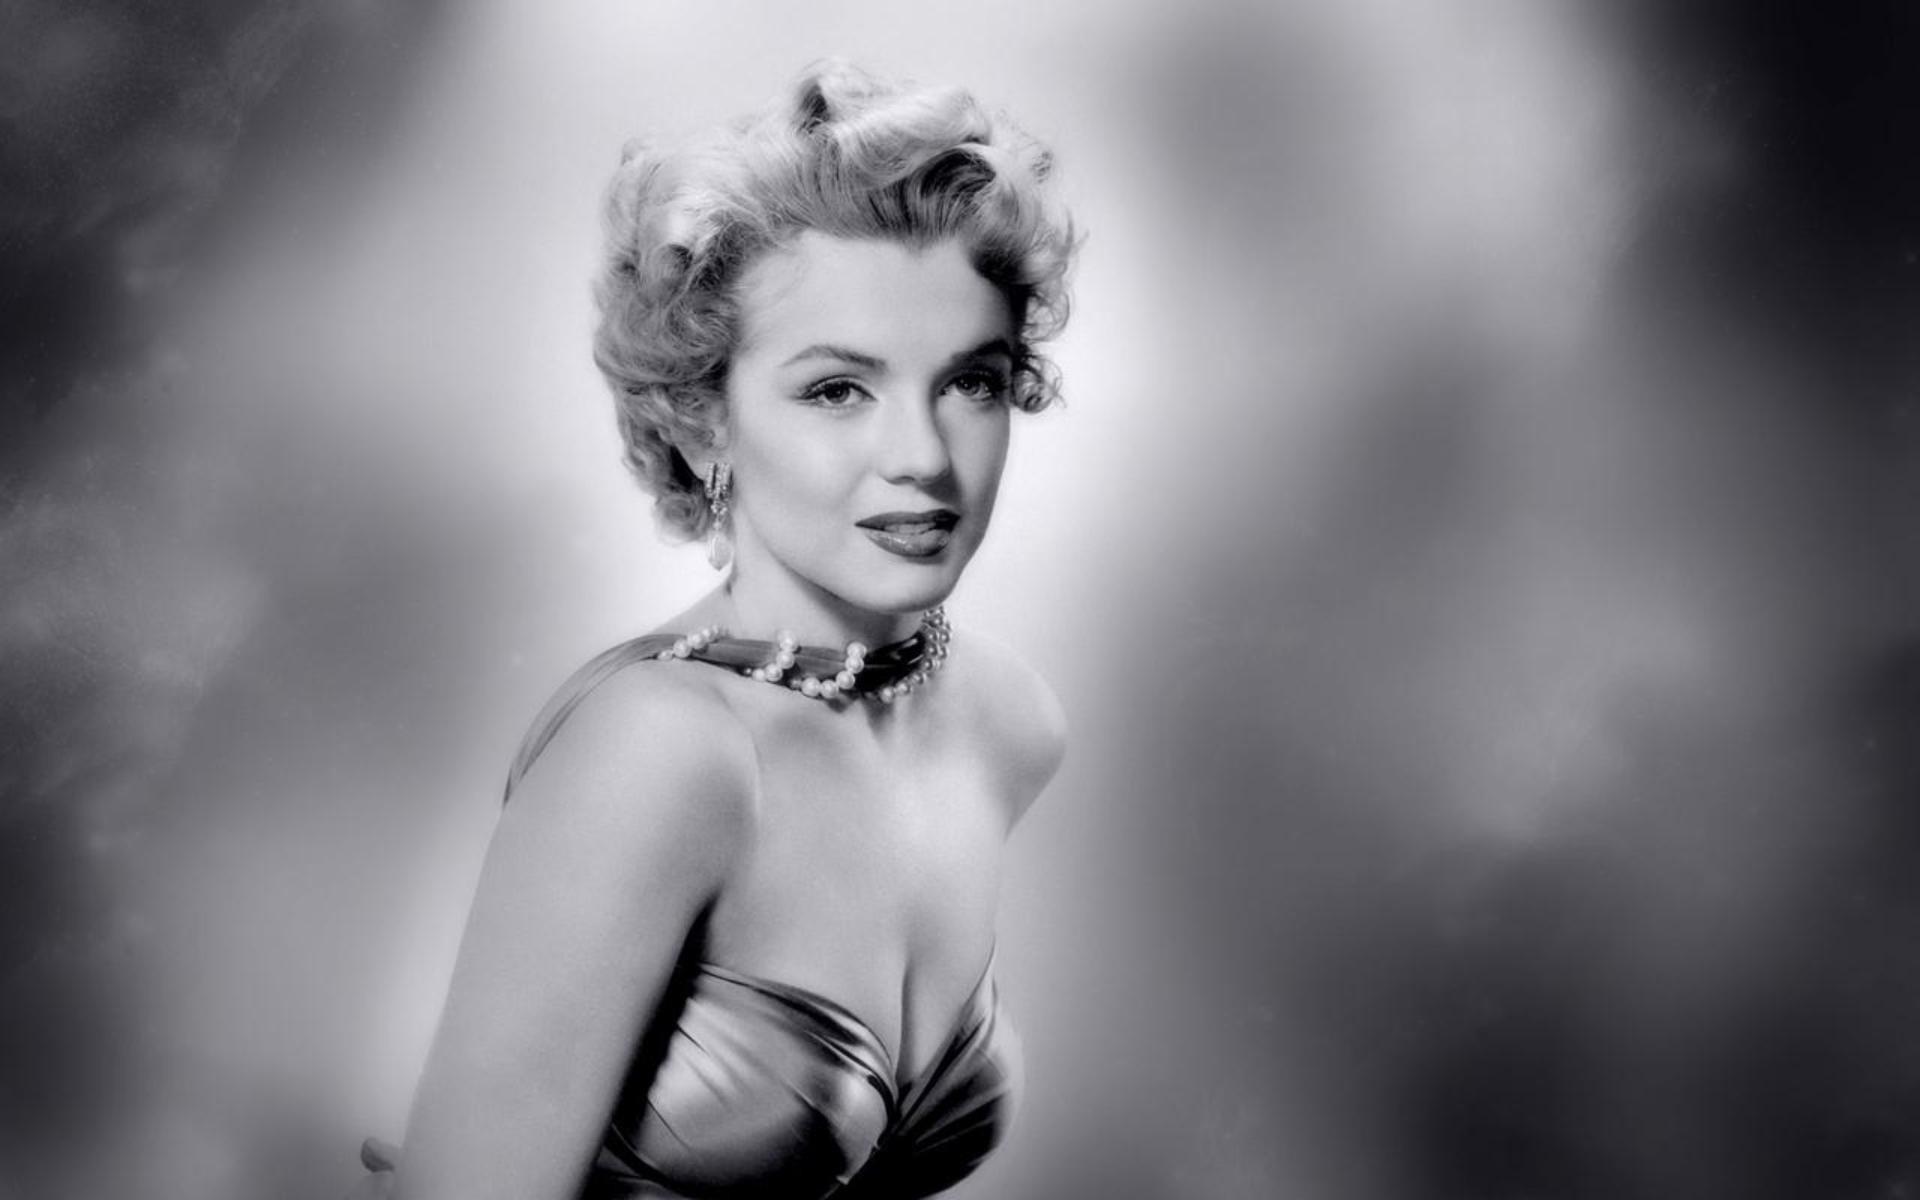 Citaten Marilyn Monroe Hd : Marilyn monroe pictures images